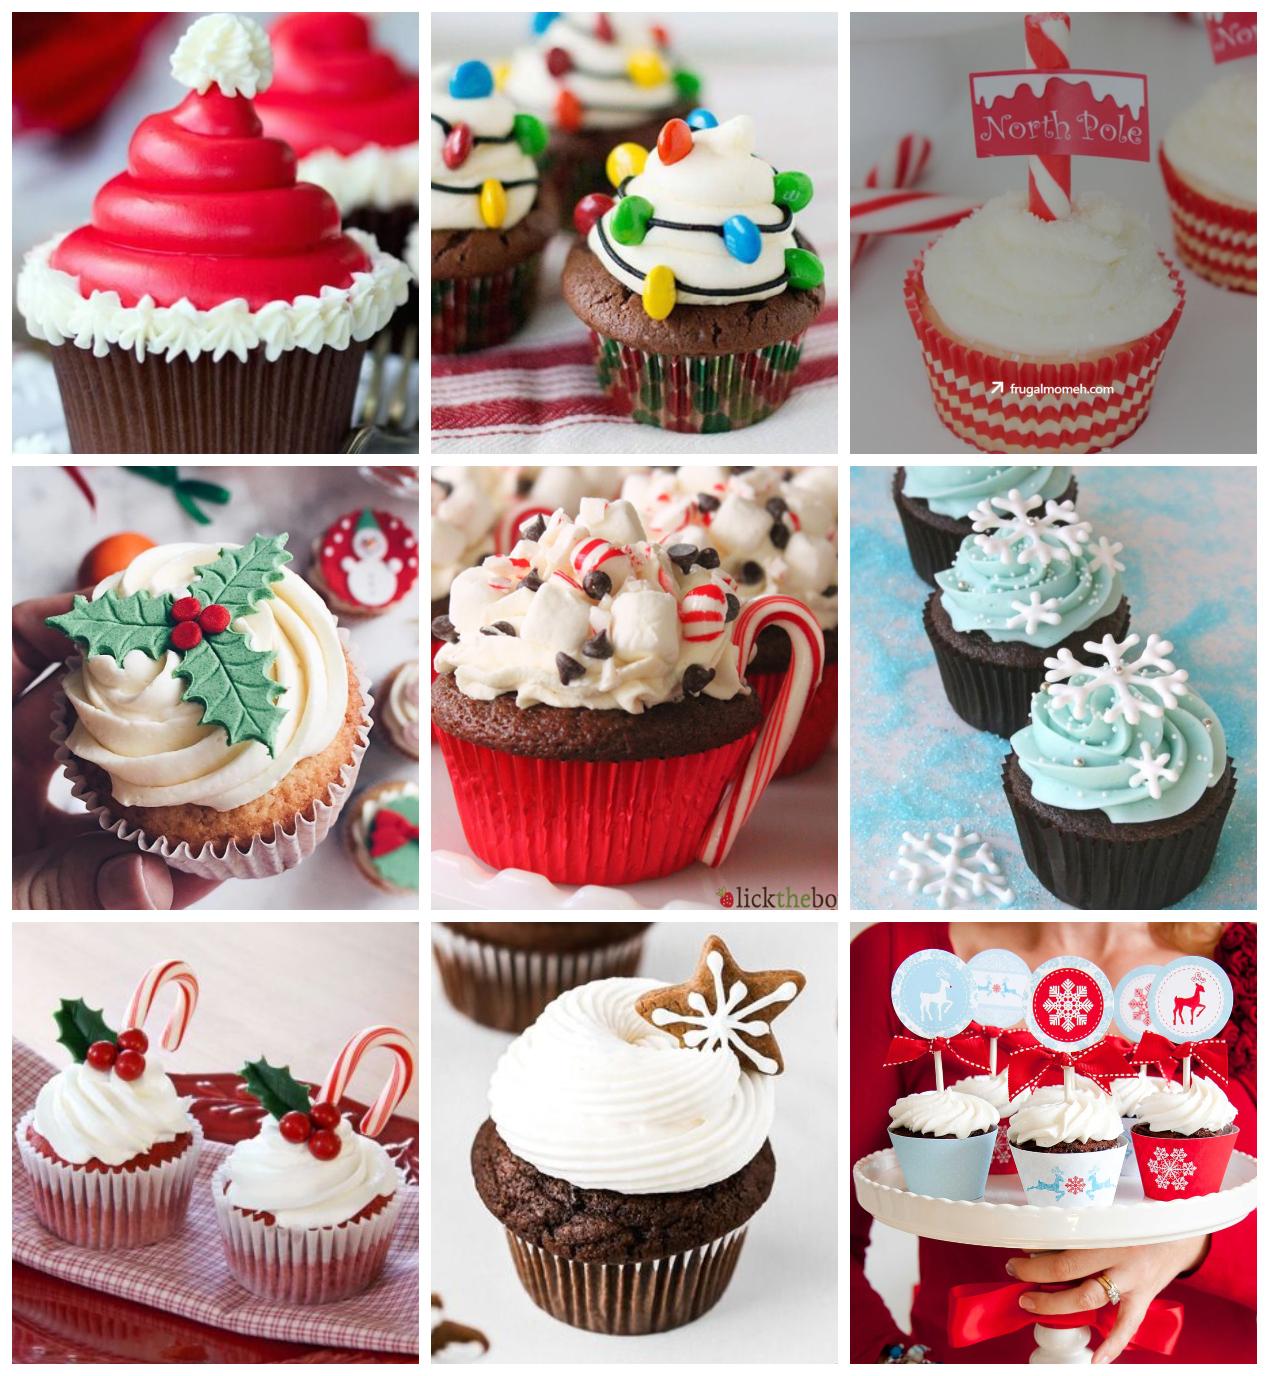 mezeskalacs_muffin_cupcake_dekoralas_cukrasz_trukk_karacsony_sutemeny_2.jpg